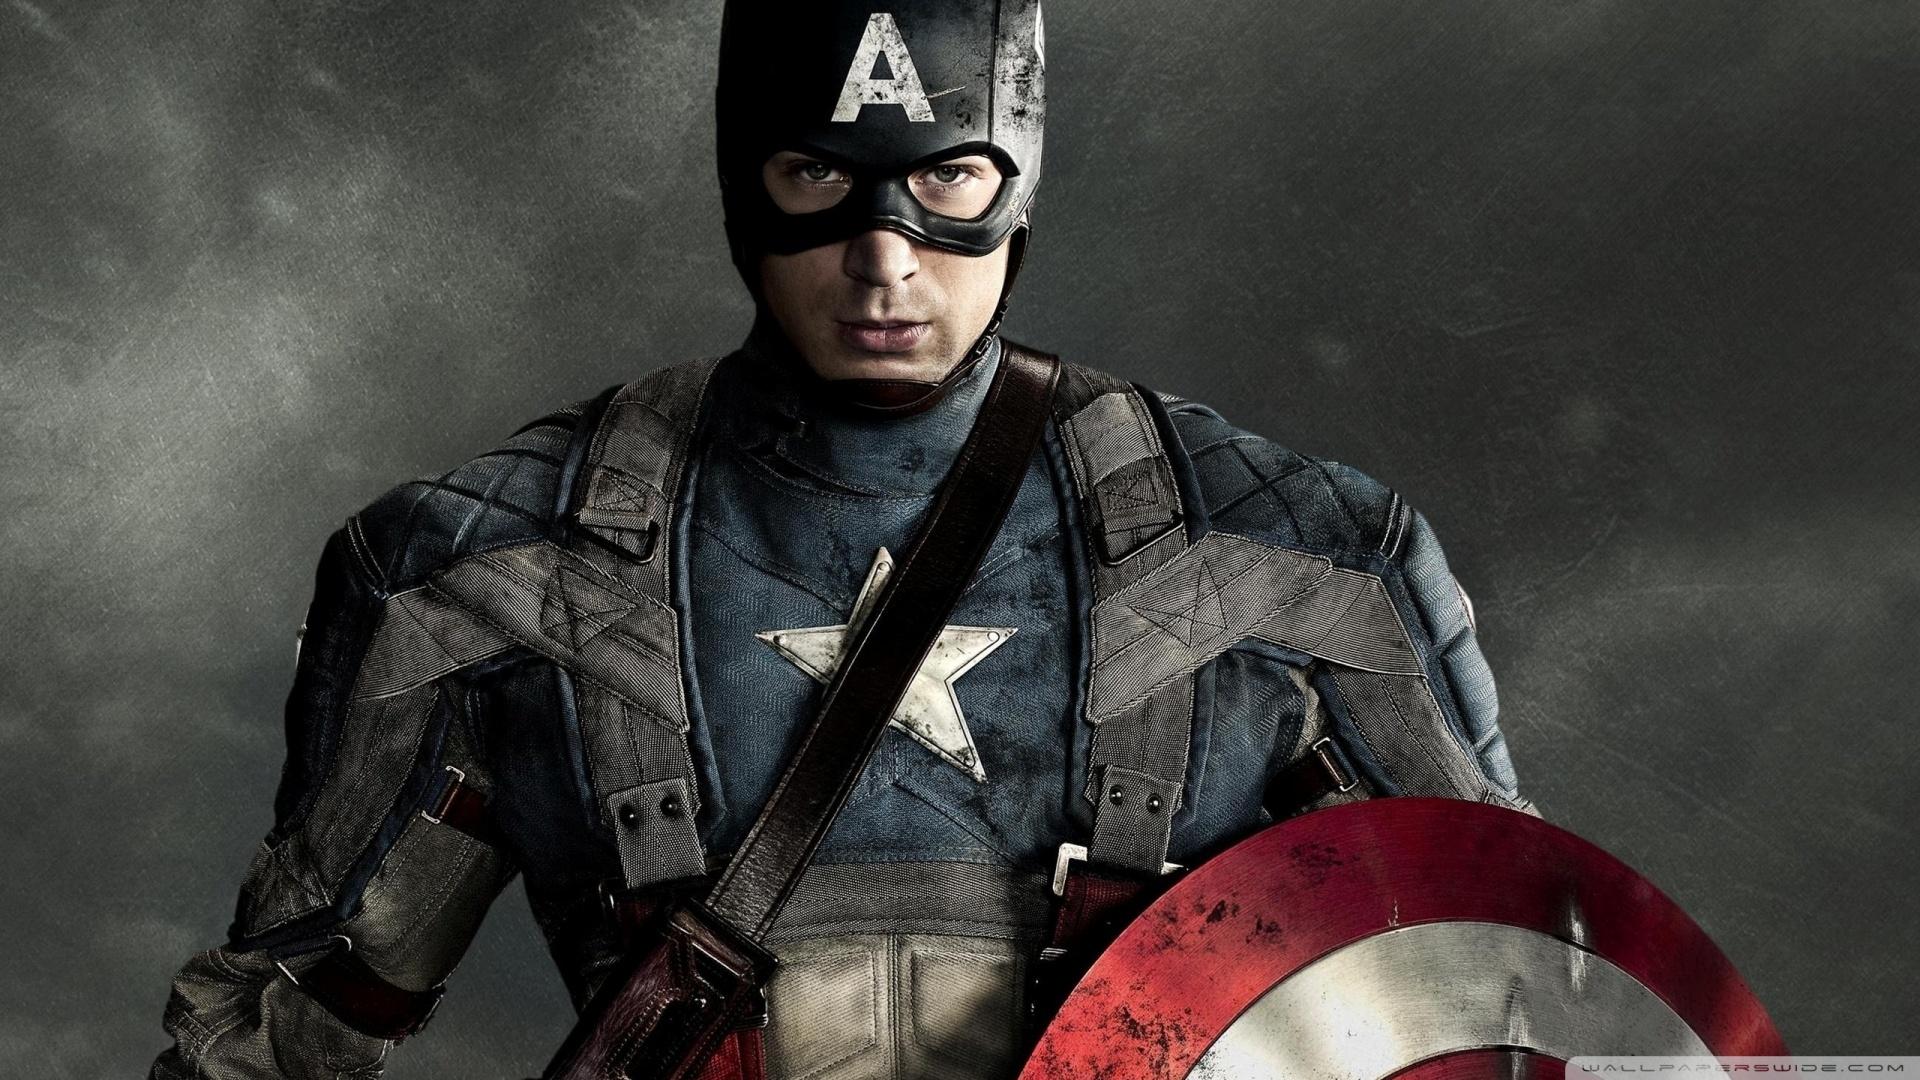 captain america 2 wallpaper 1920x1080 1920x1080